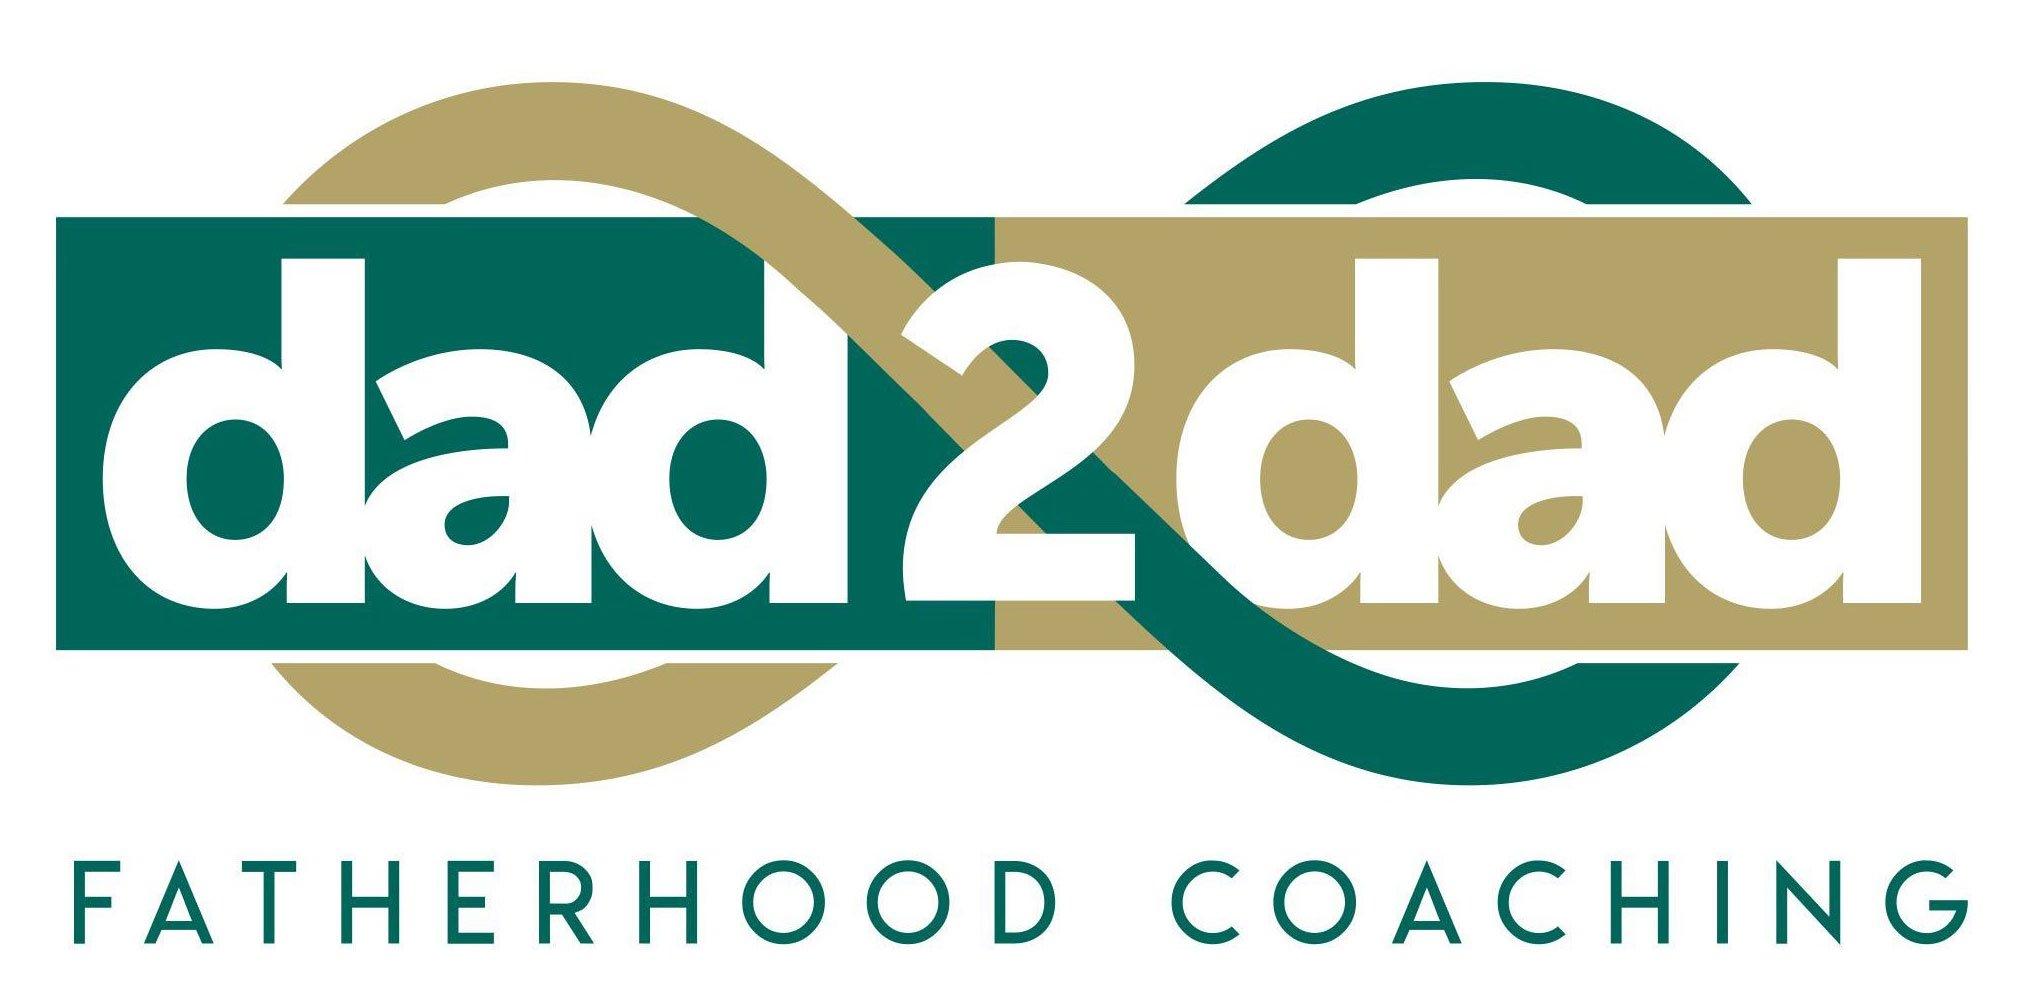 dad2dad fatherhood coaching